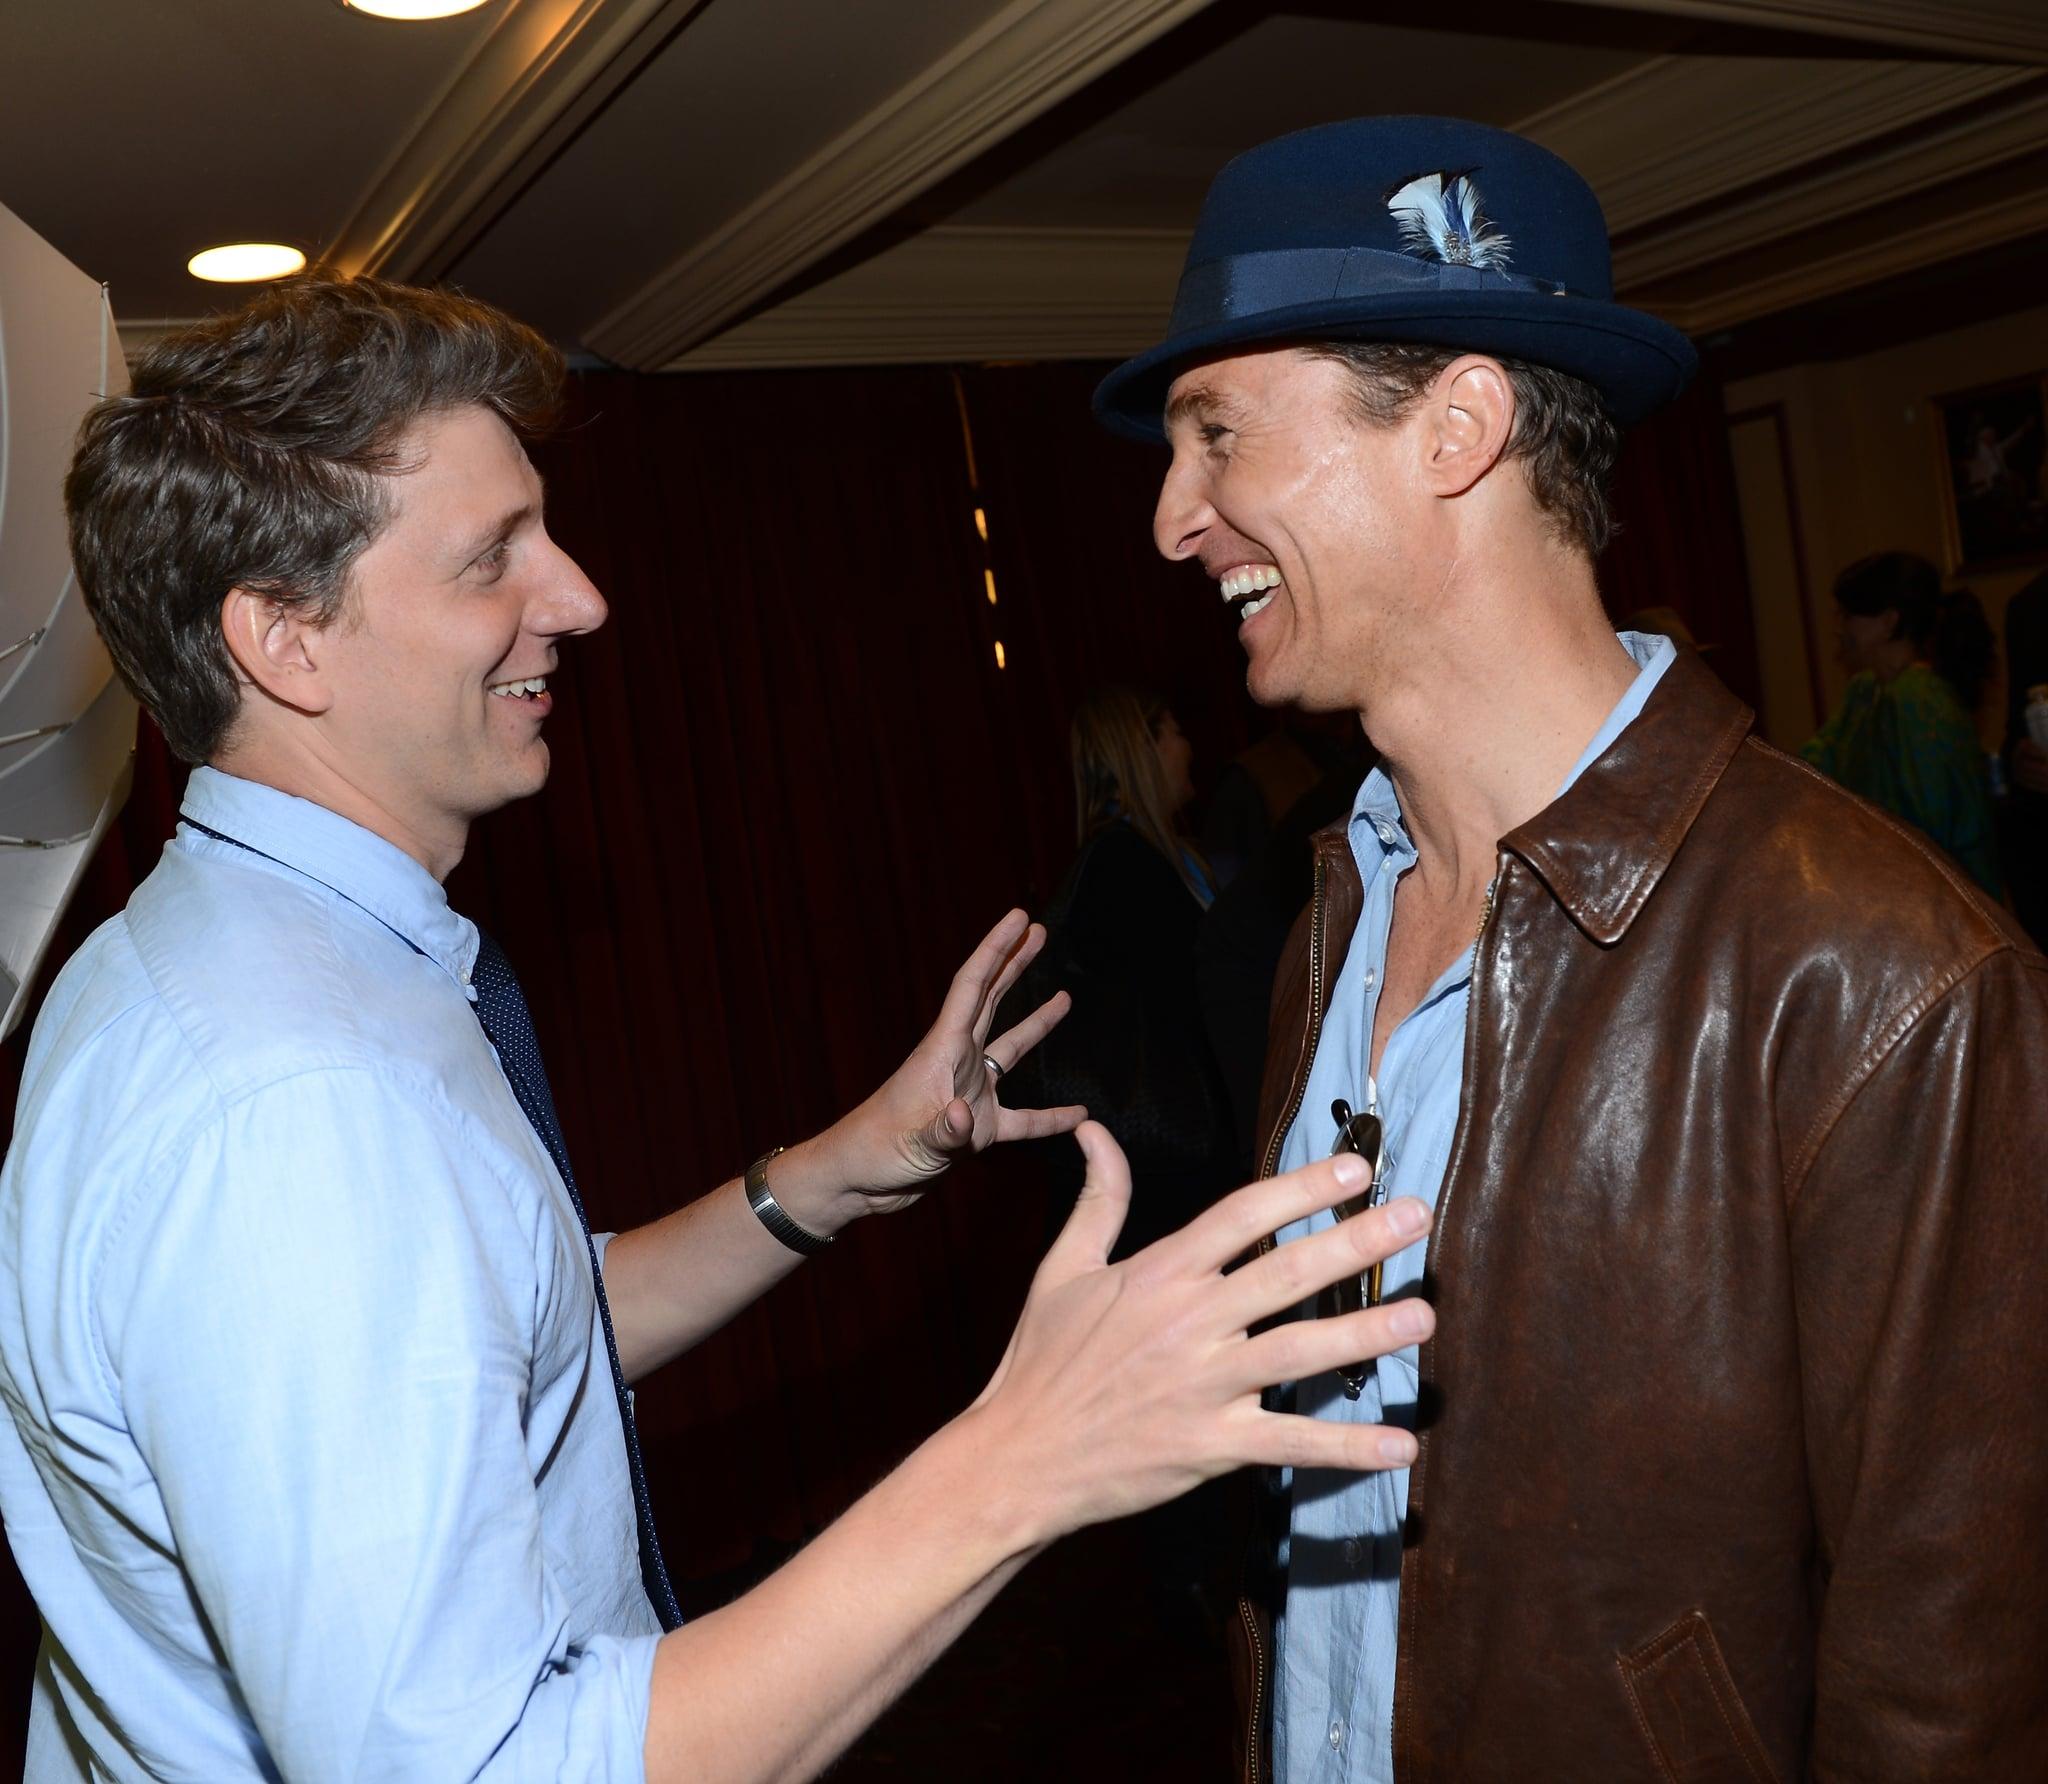 Matthew McConaughey got together with Jeff Nichols at the Mud screening at SXSW.